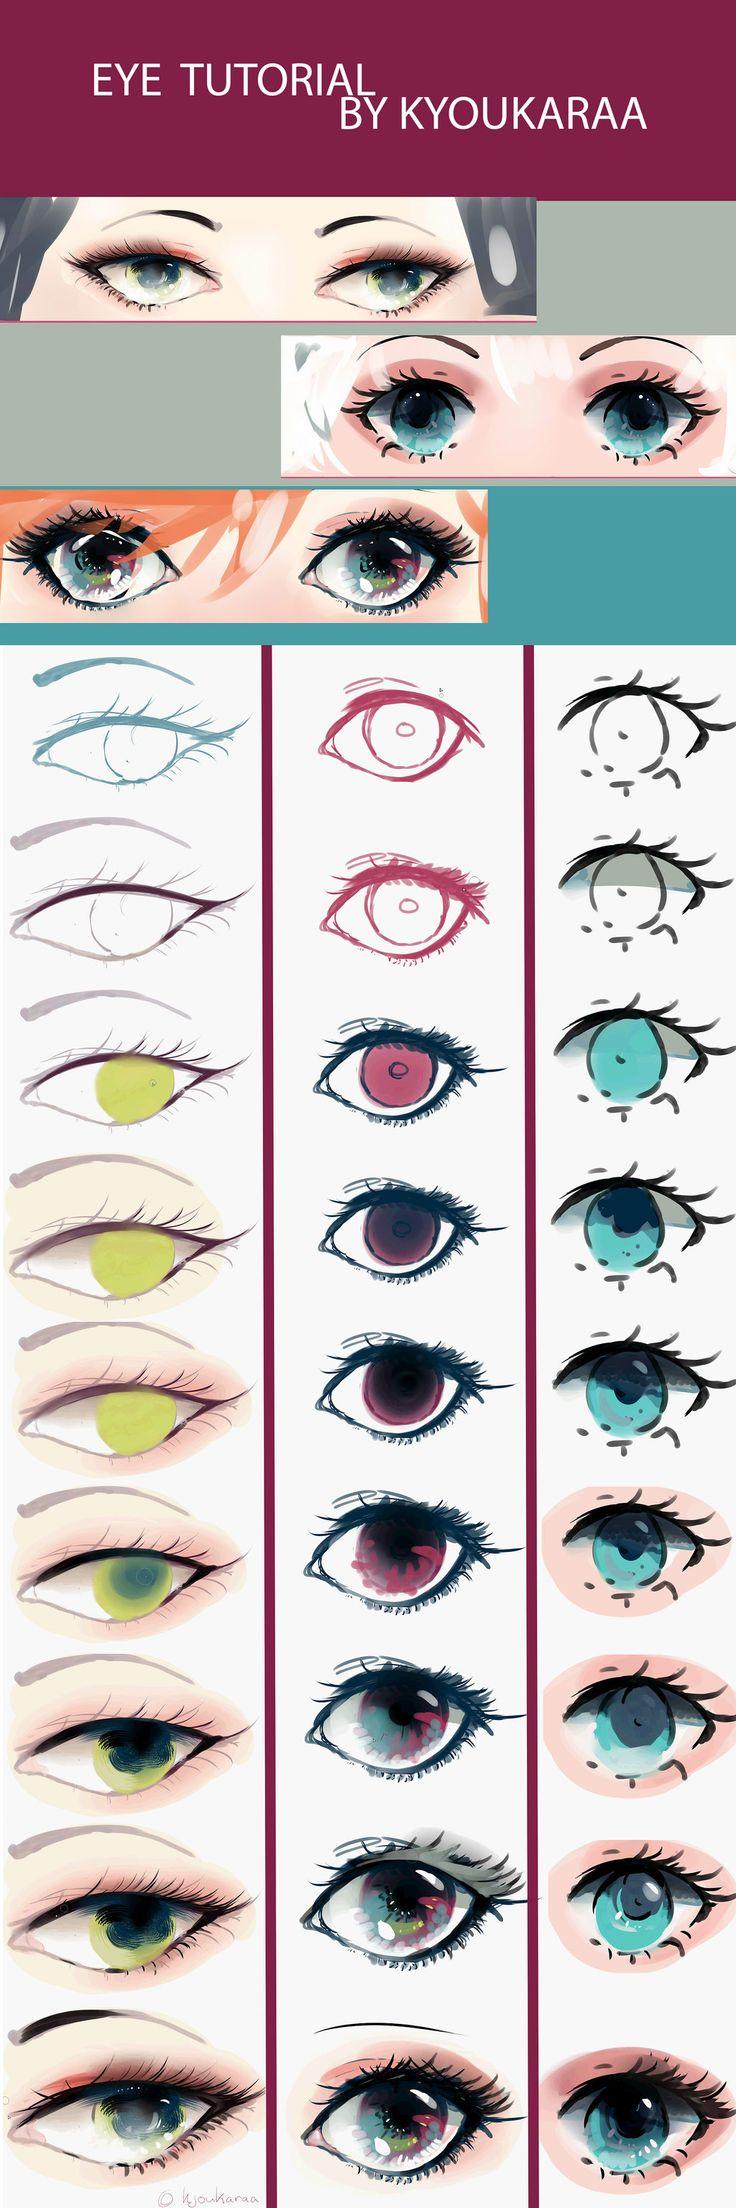 Eye Tutorial (+video) By Kyoukaraaiantart On @deviantart